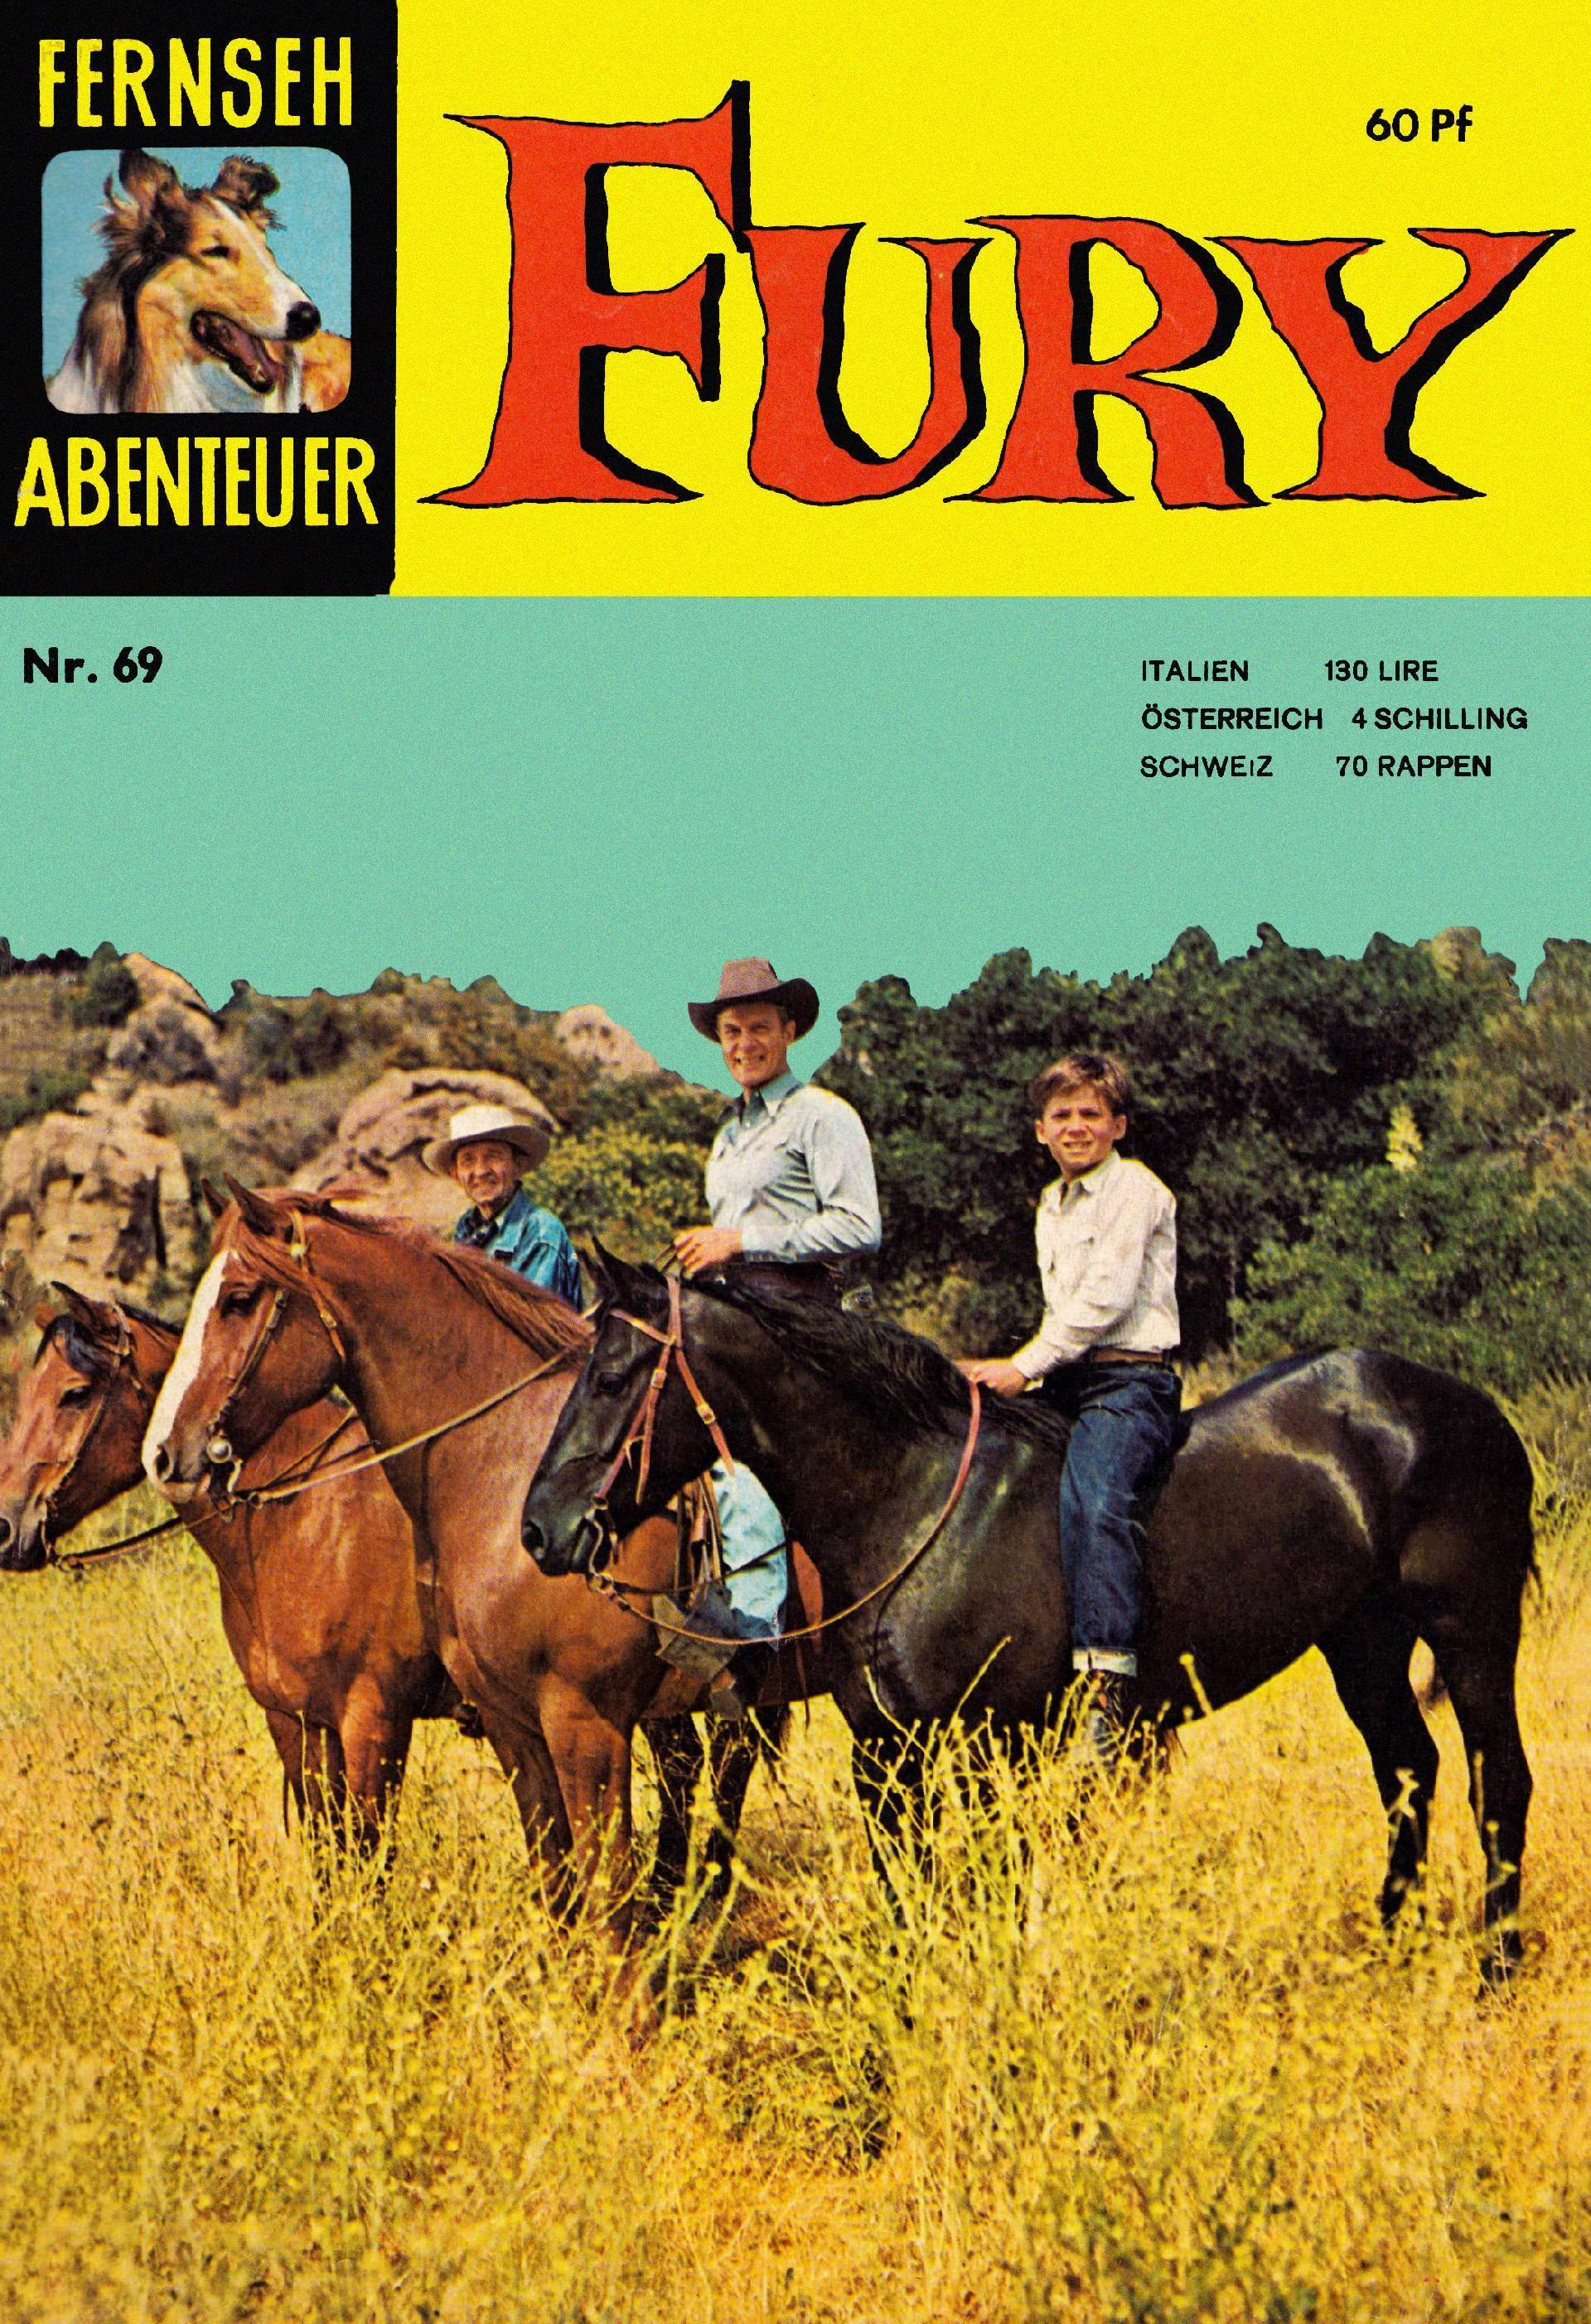 080145 Description Fernseh Abenteuer 001  134 Fernseh Abenteuer 069 Neuer Tessloff Verlag 1959 1964 Team Paule cbr 6 50 GB